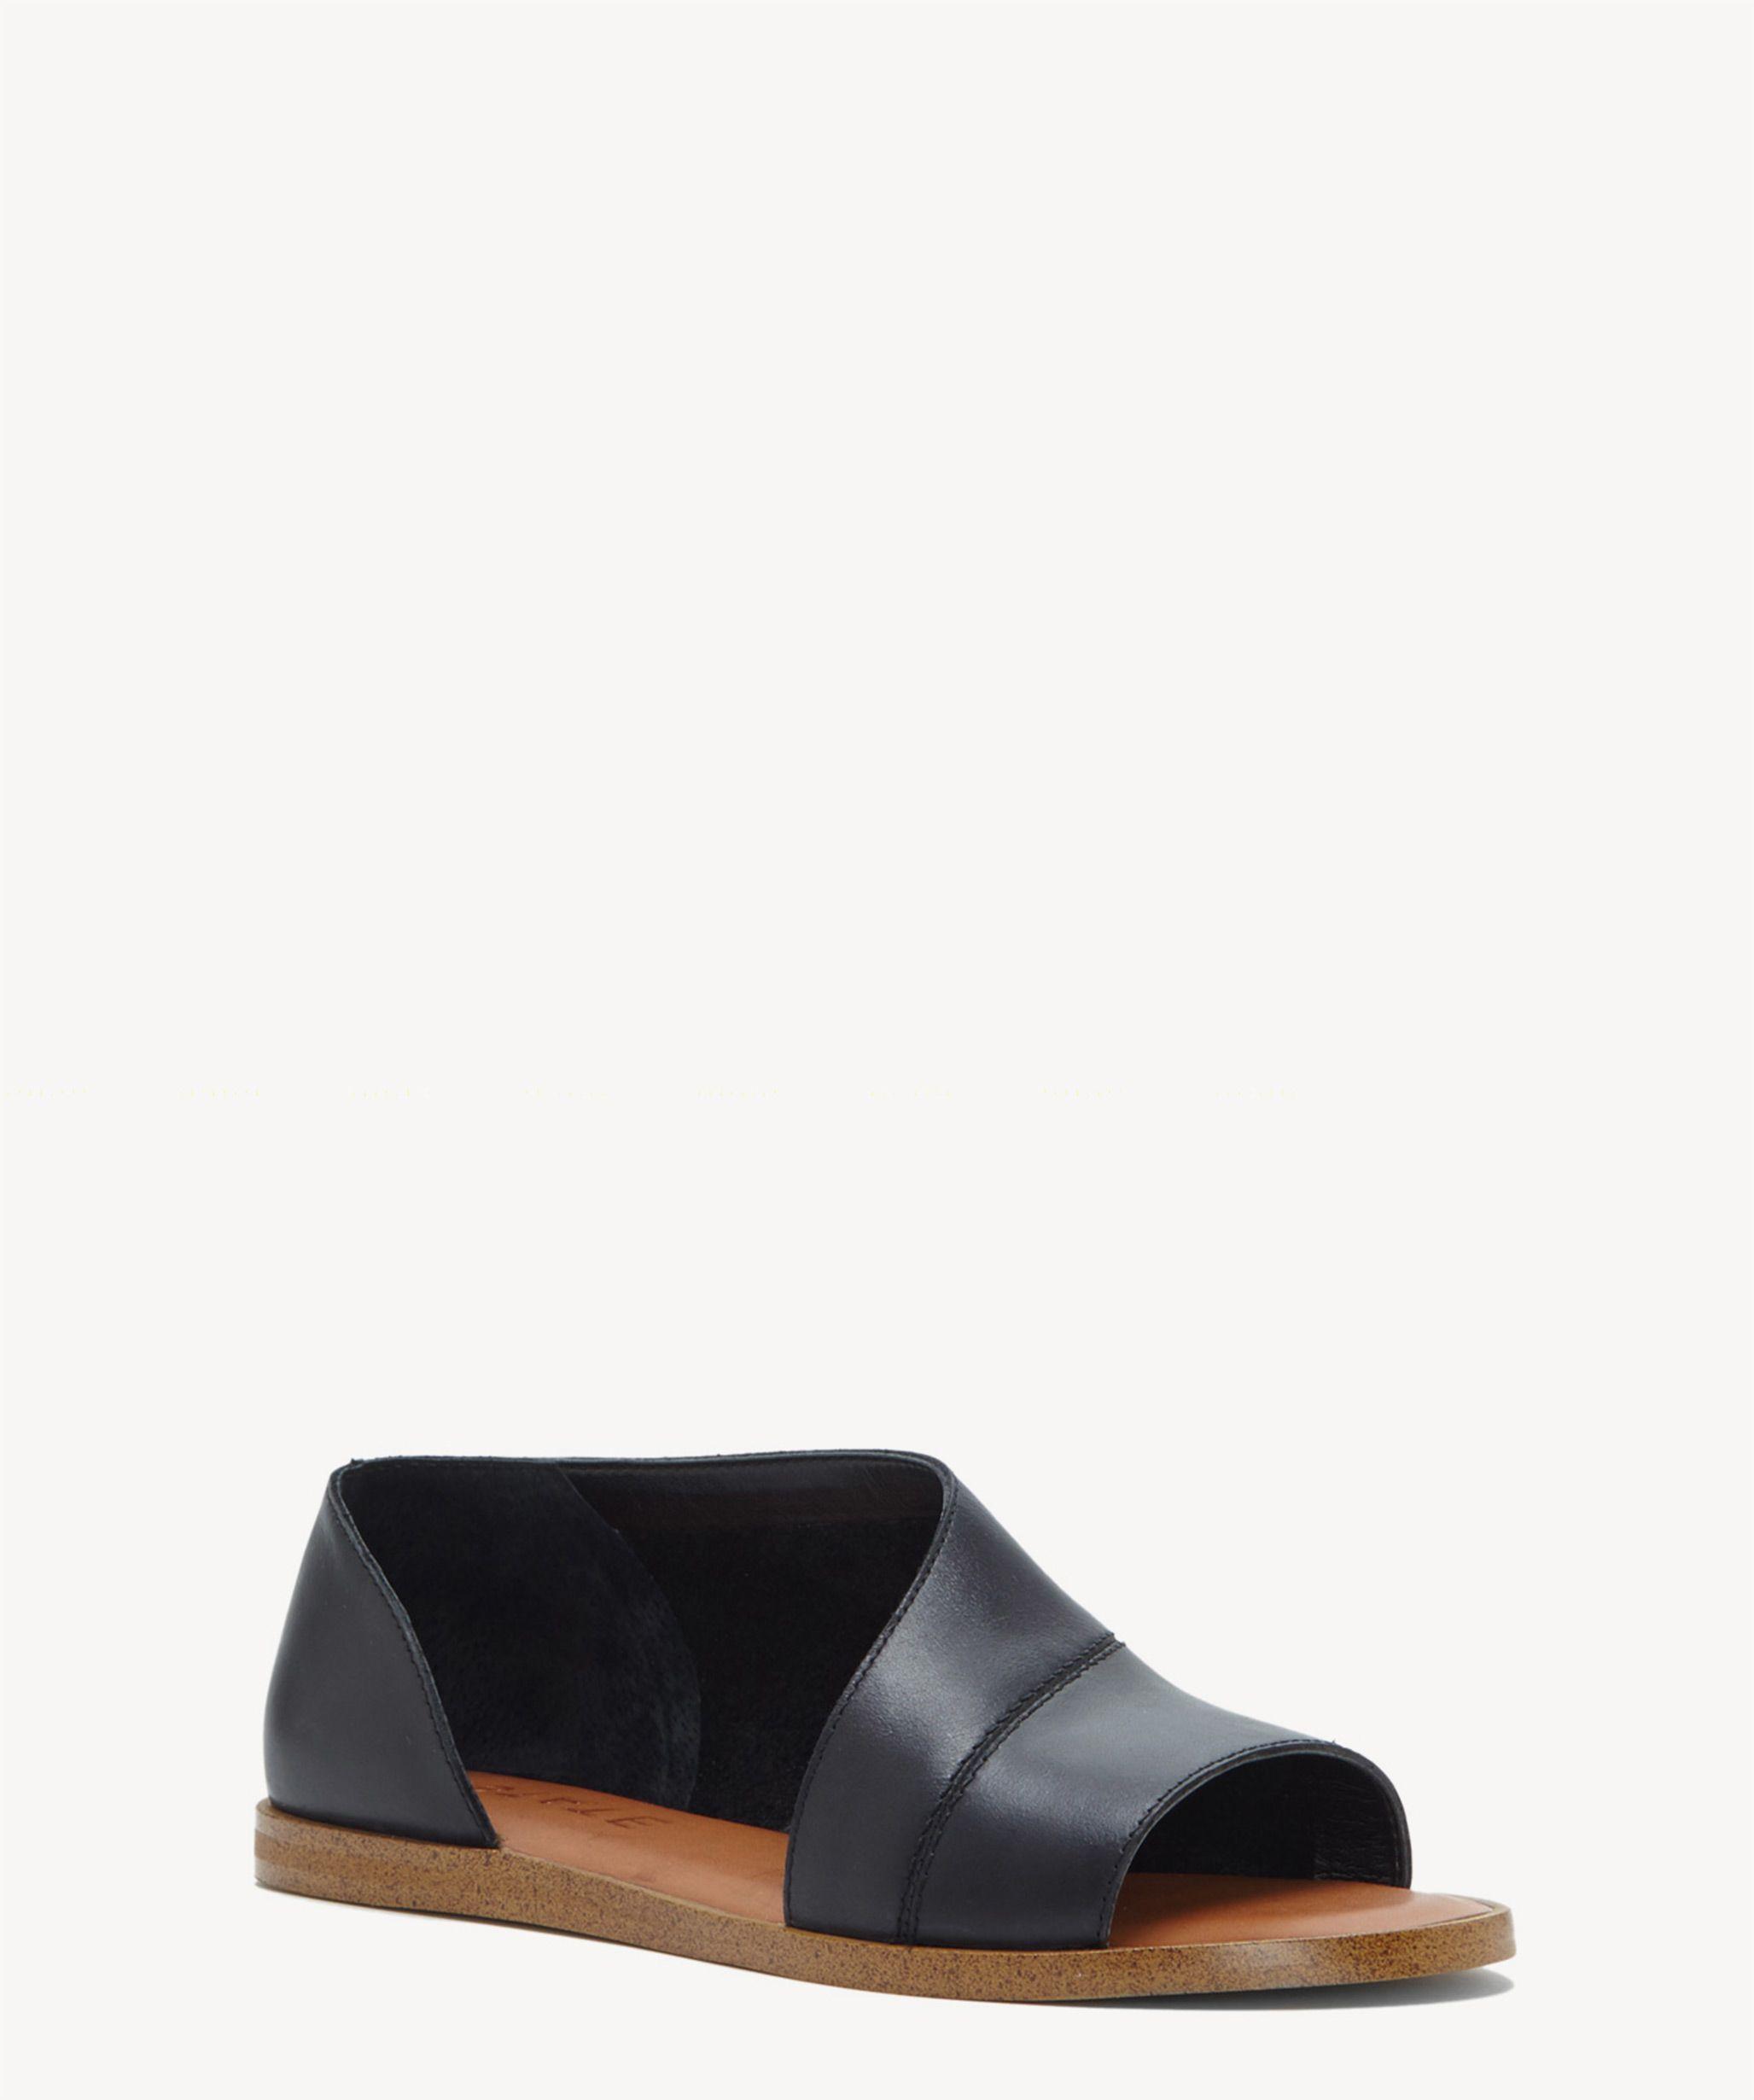 Sole society shoe, Shoes, Open toe flats